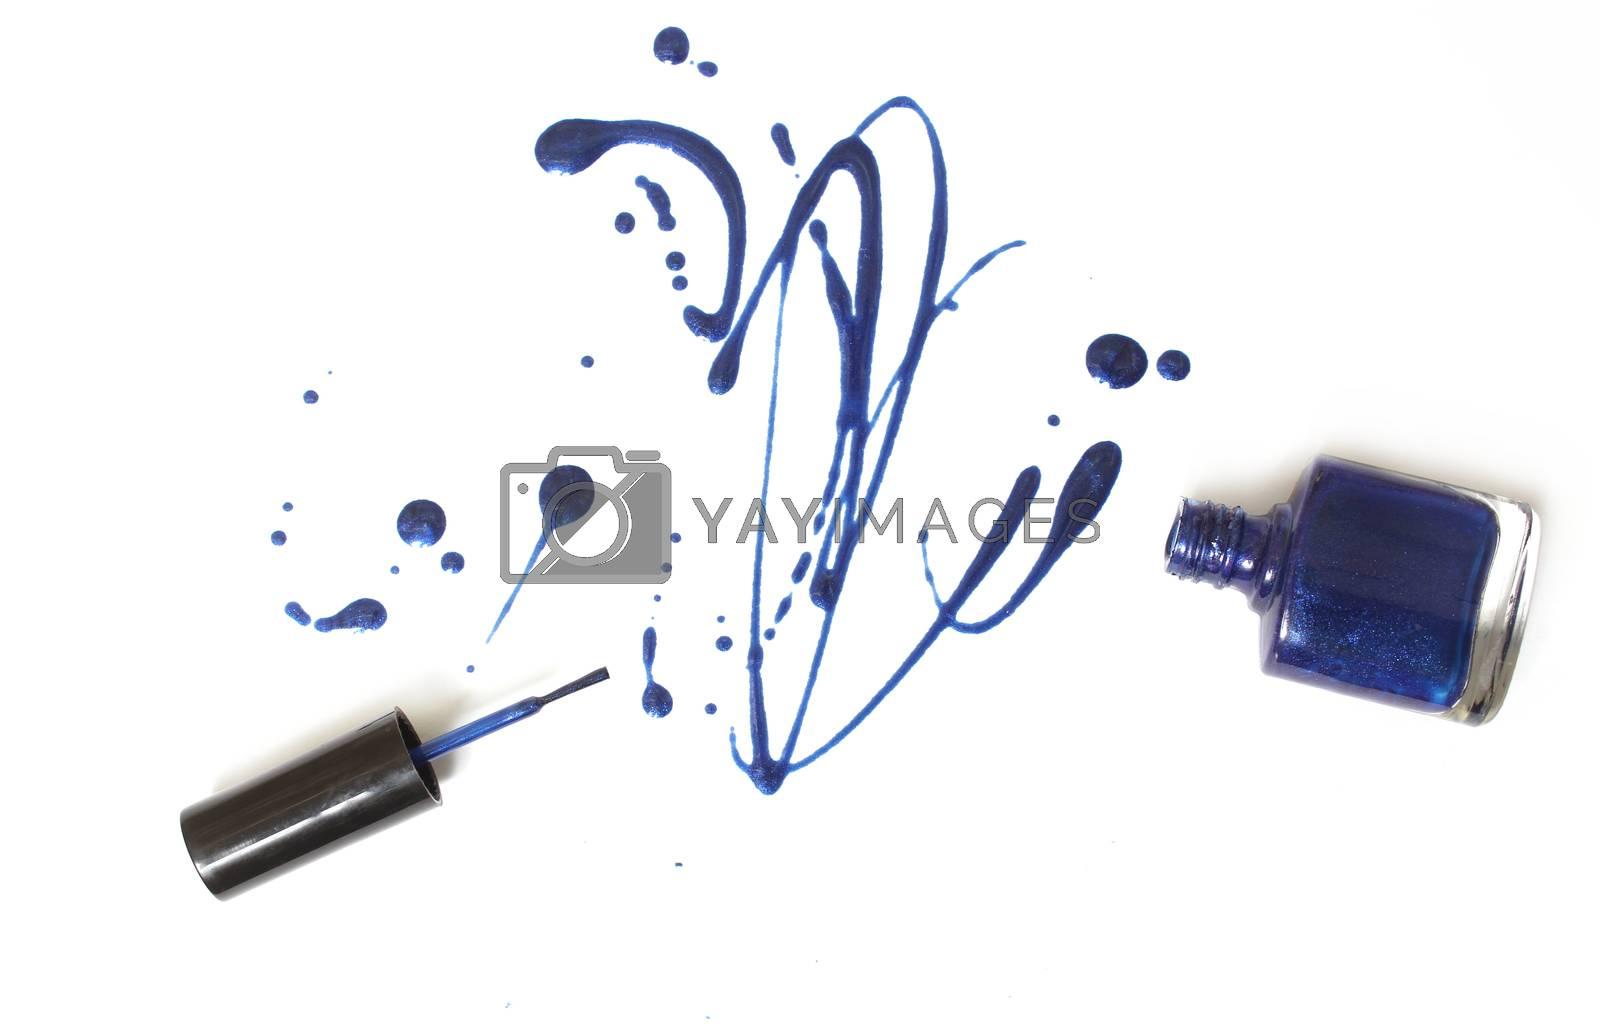 Spilled Blue Nail polish on White Background